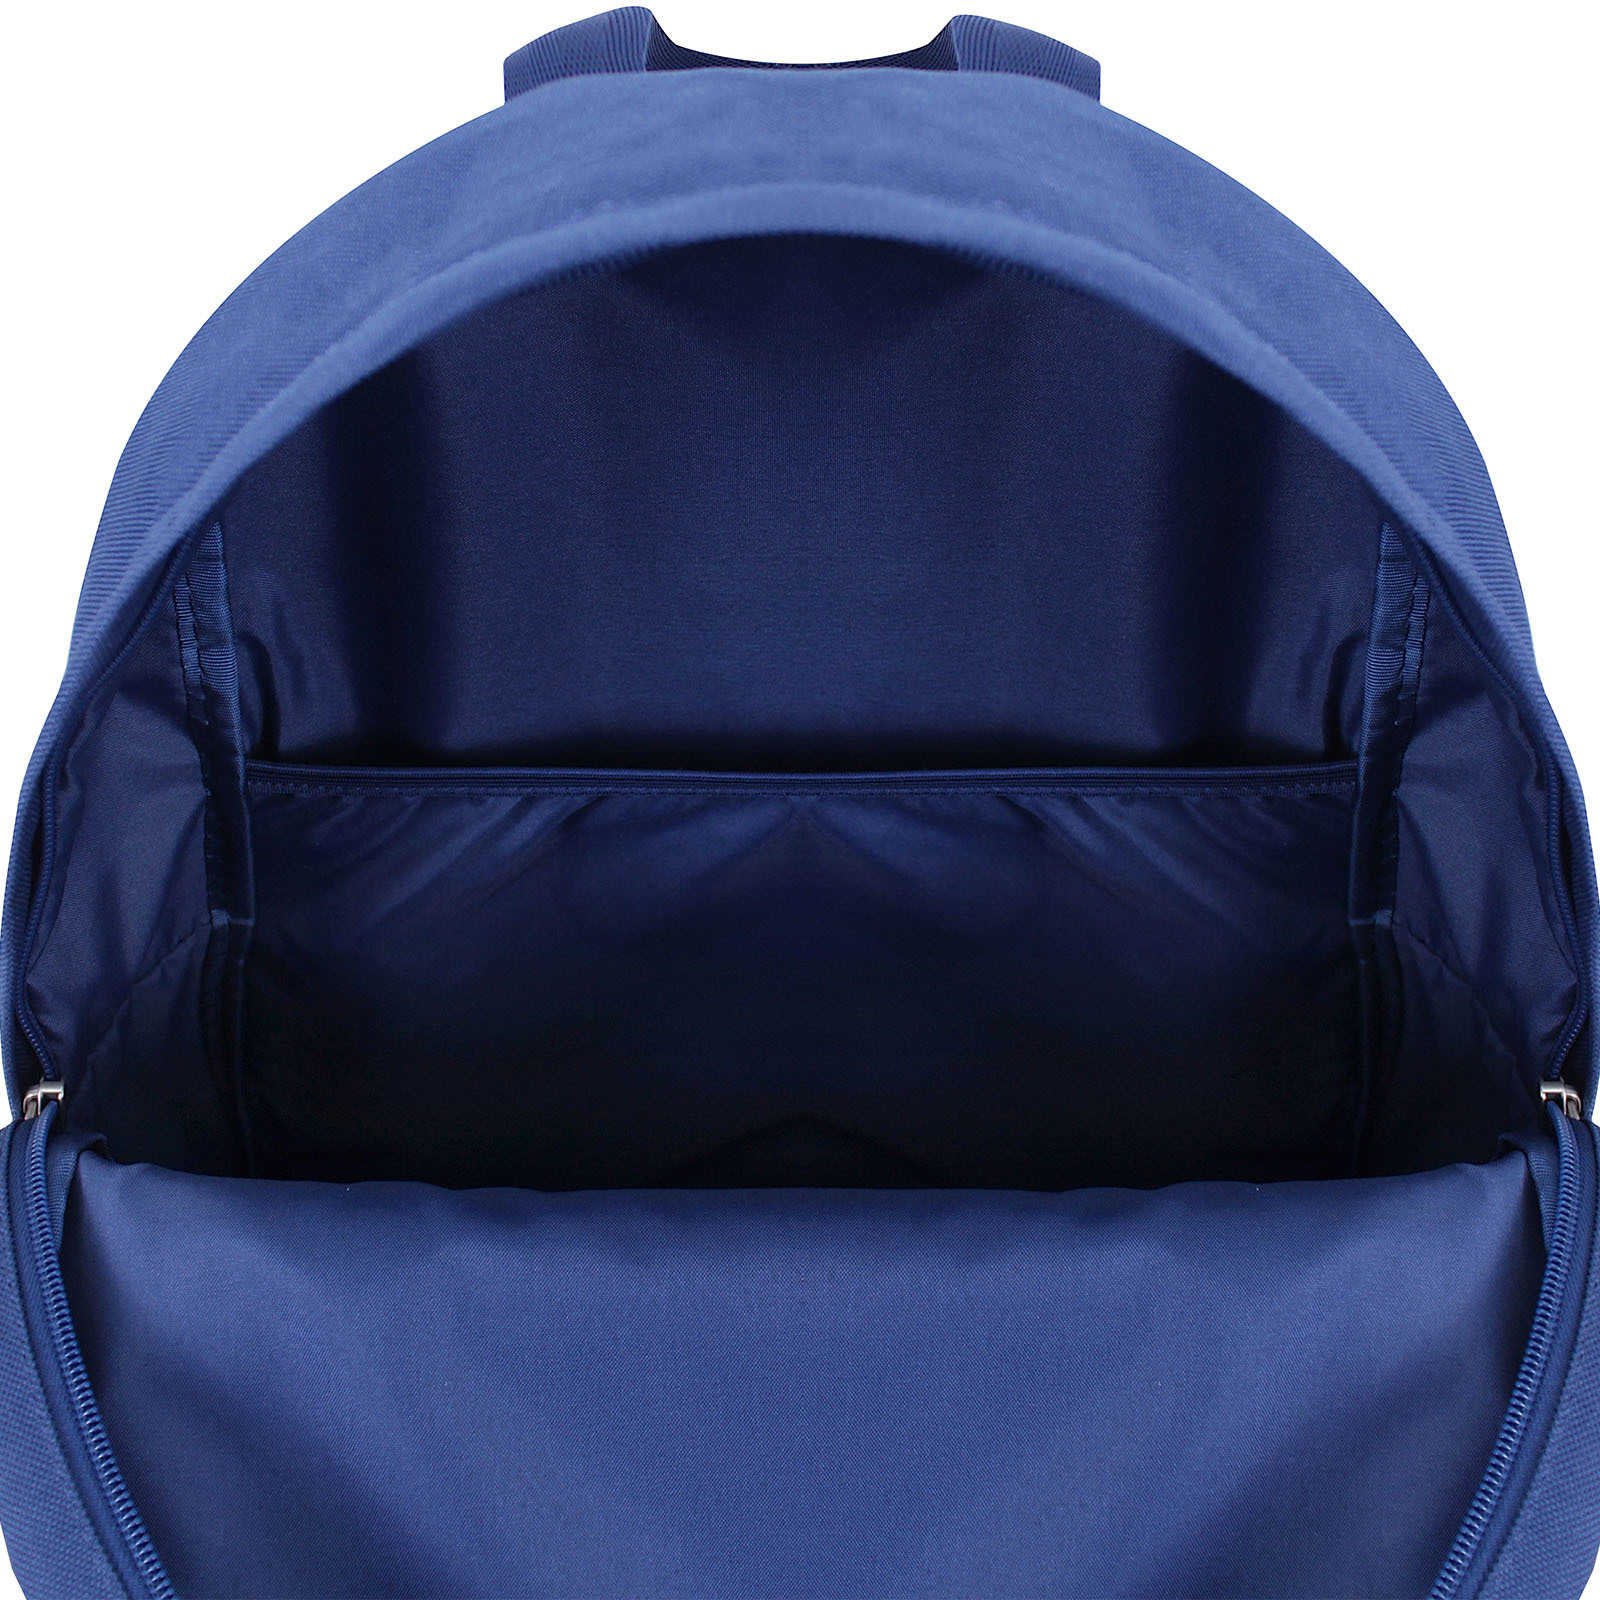 Рюкзак Bagland Молодежный W/R 17 л. Синий 762 (00533662) фото 5